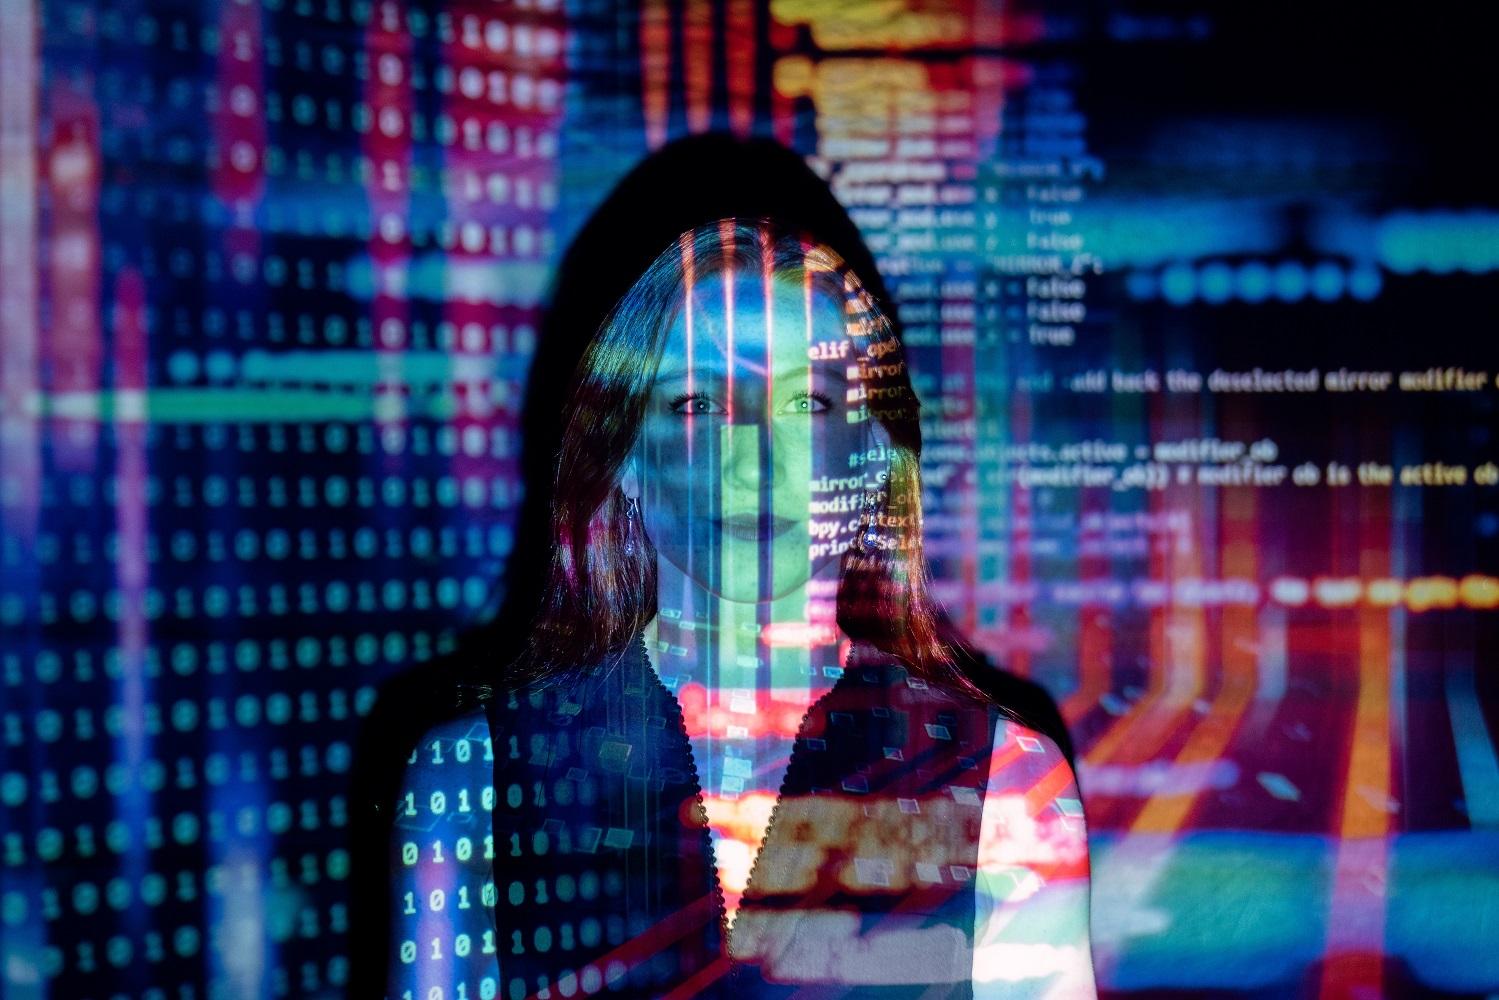 majid-al-futtaim-launches-regions-first-private-sector-women-coders-program